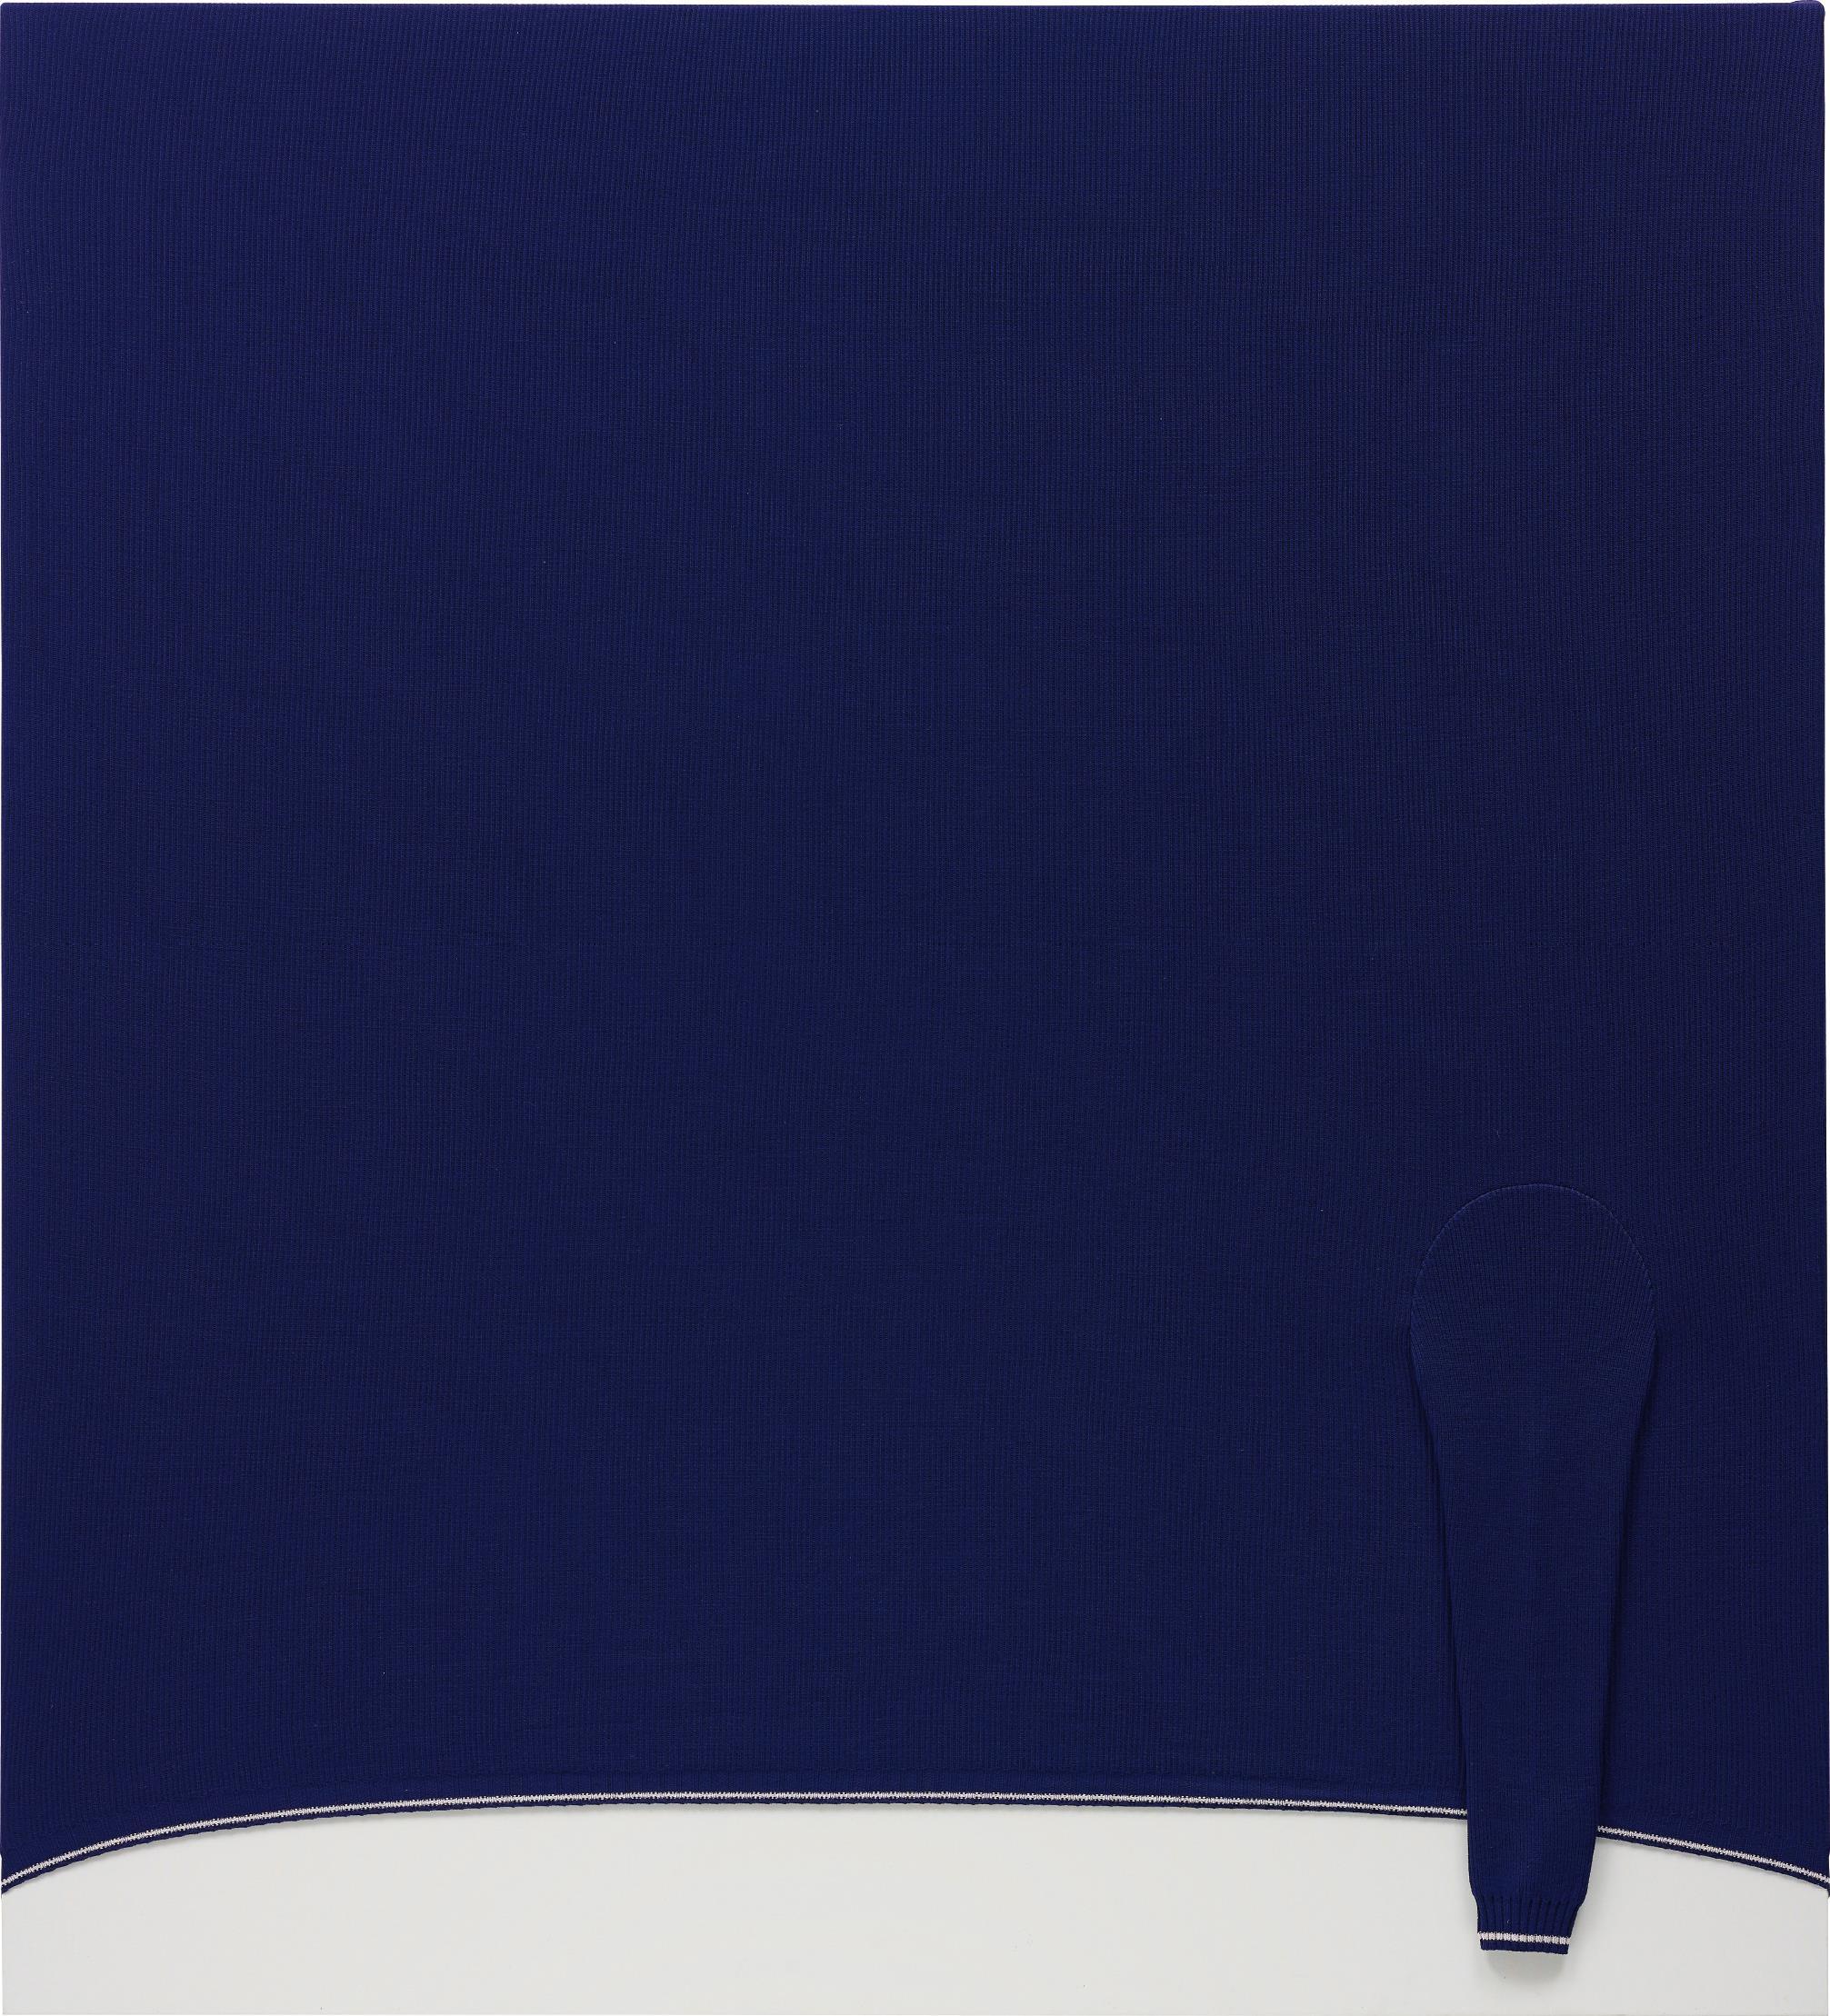 Erwin Wurm-Untitled-2007